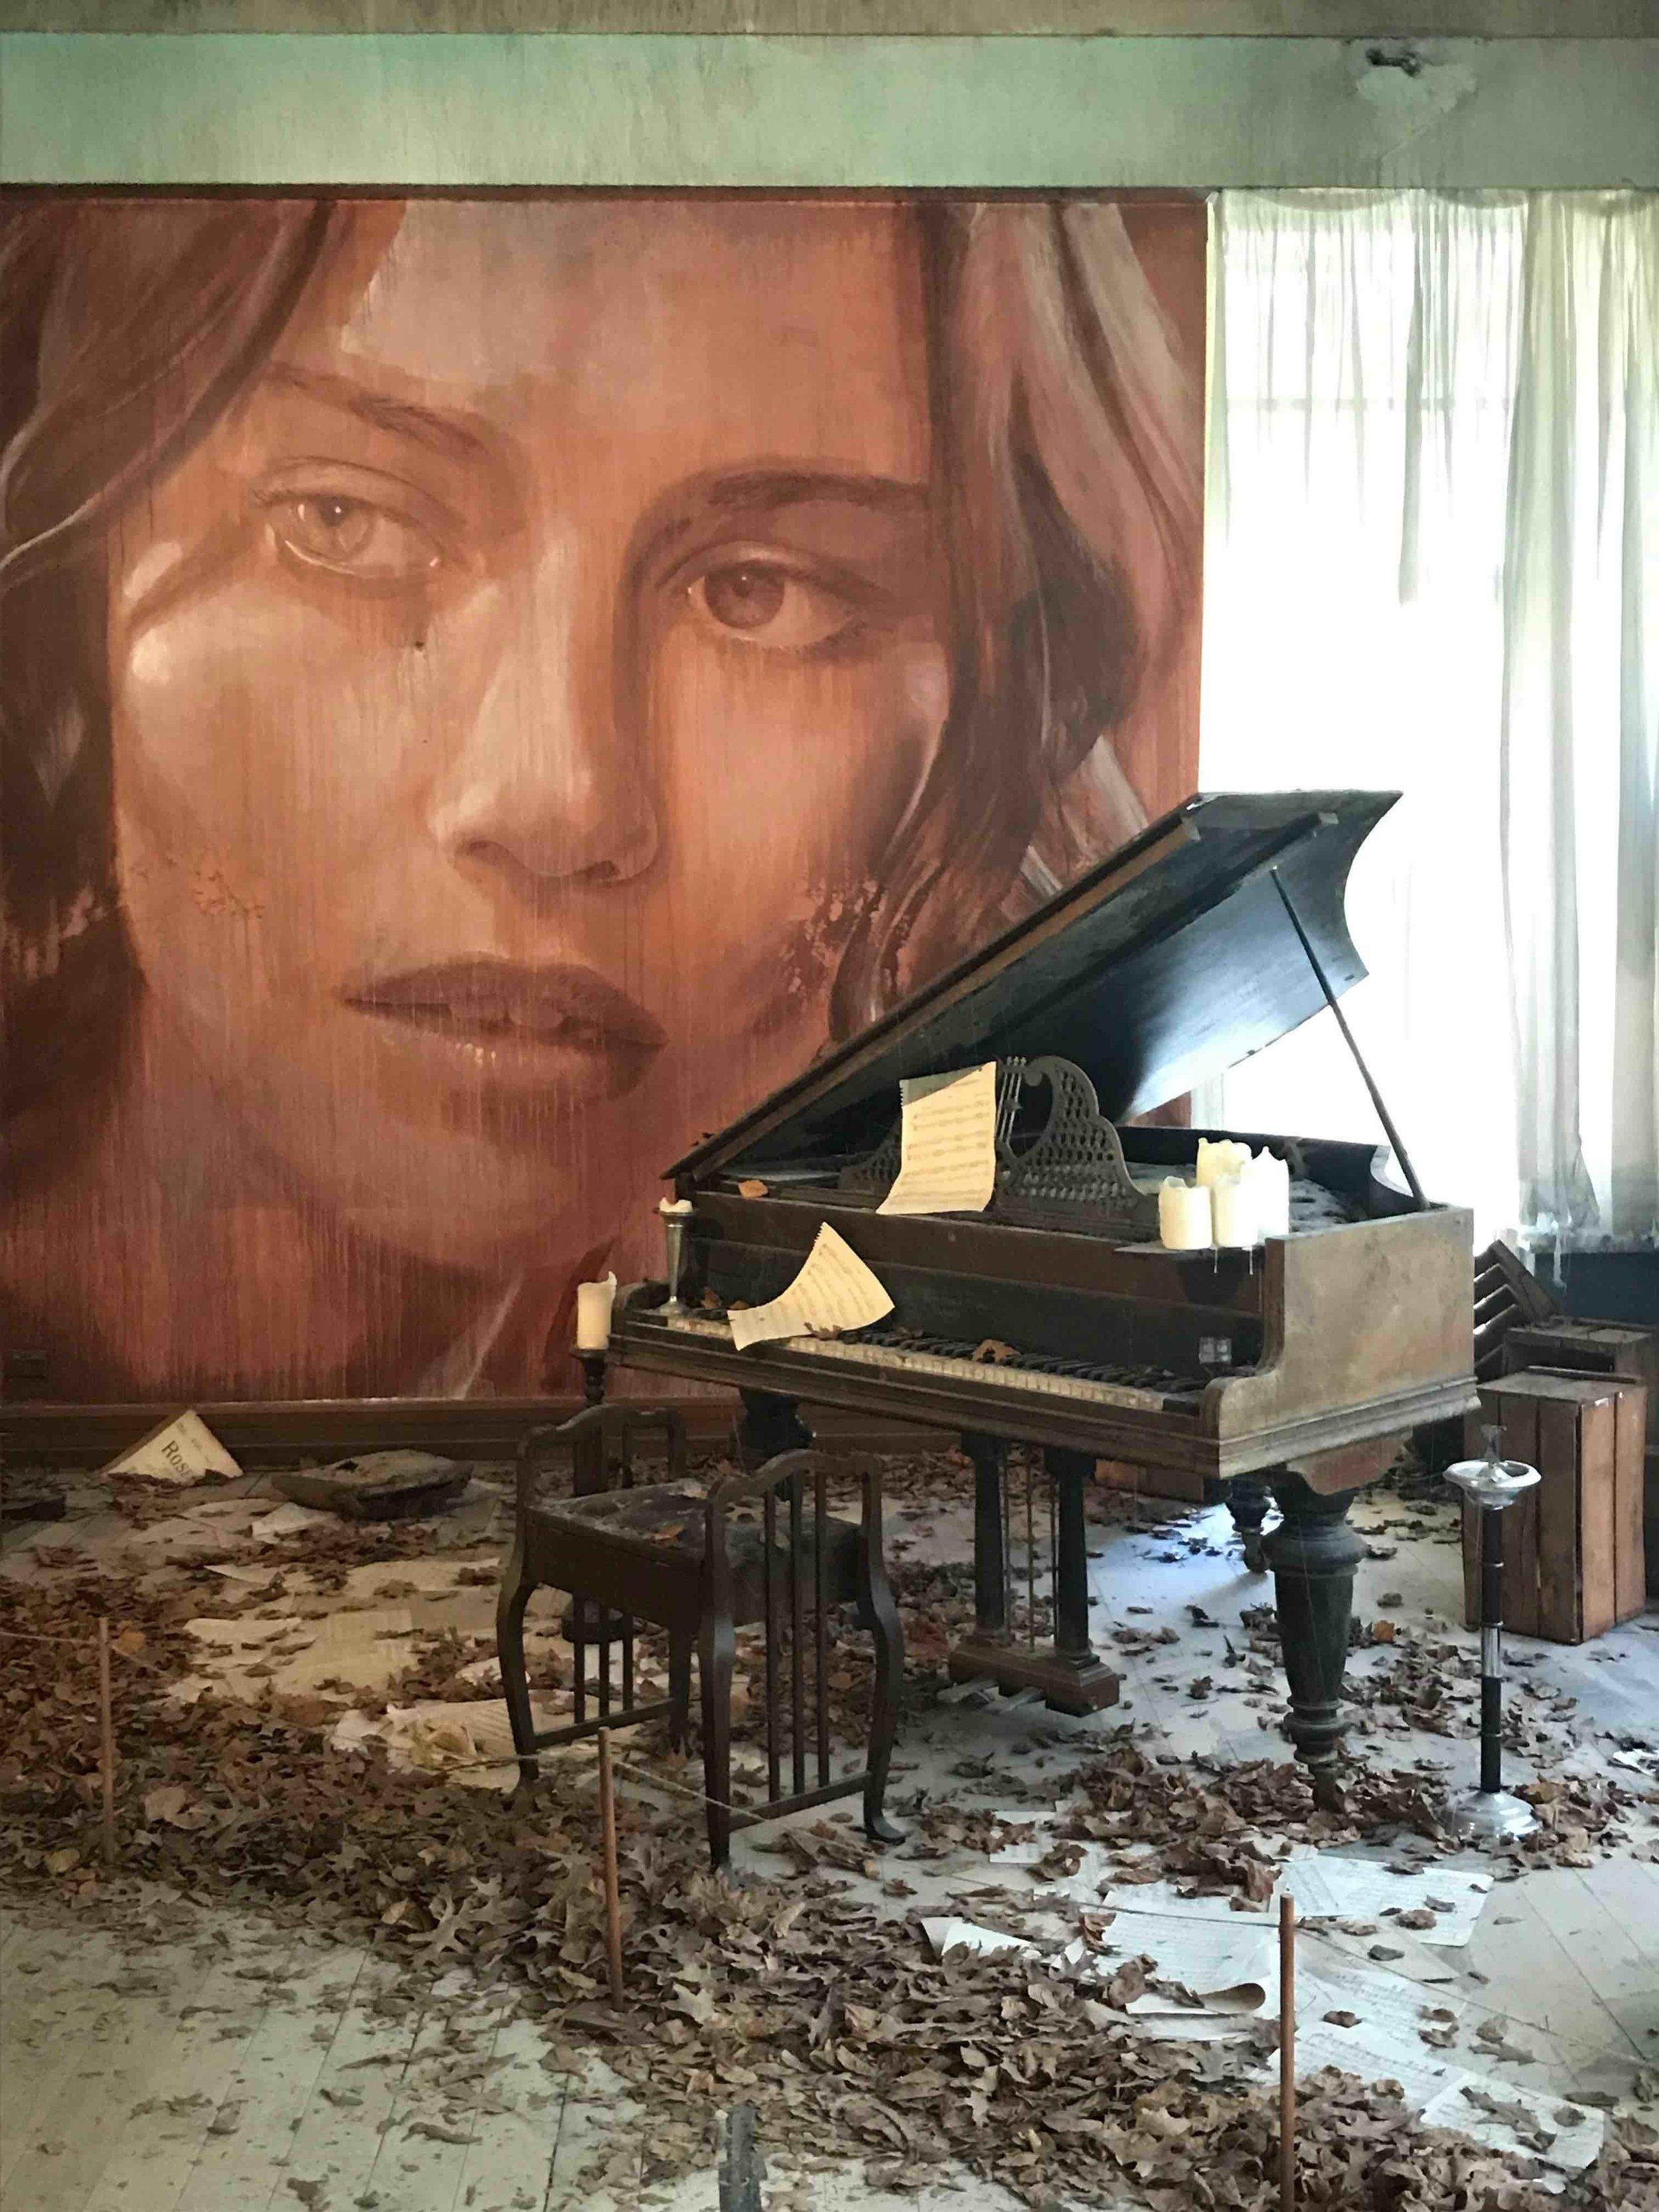 The Music Room (Photo: Laura Jocic)